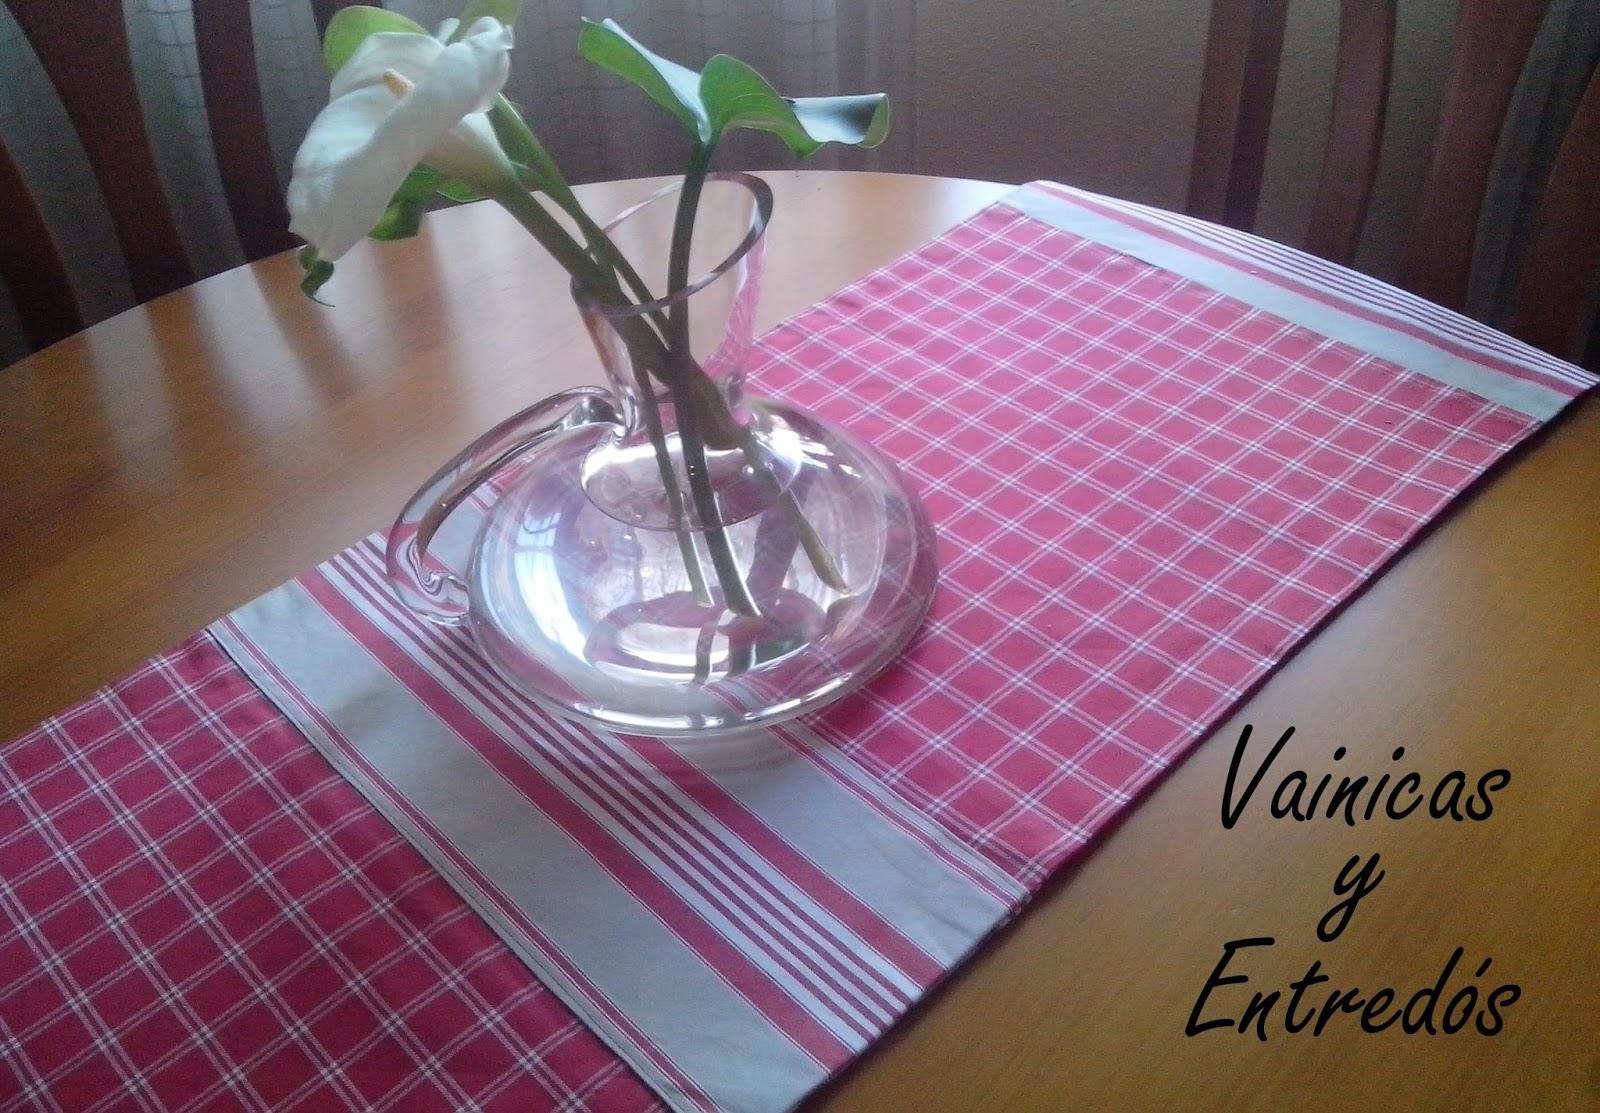 Vainicas y entred s camino de mesa con telas de ikea for Caminos para mesas redondas